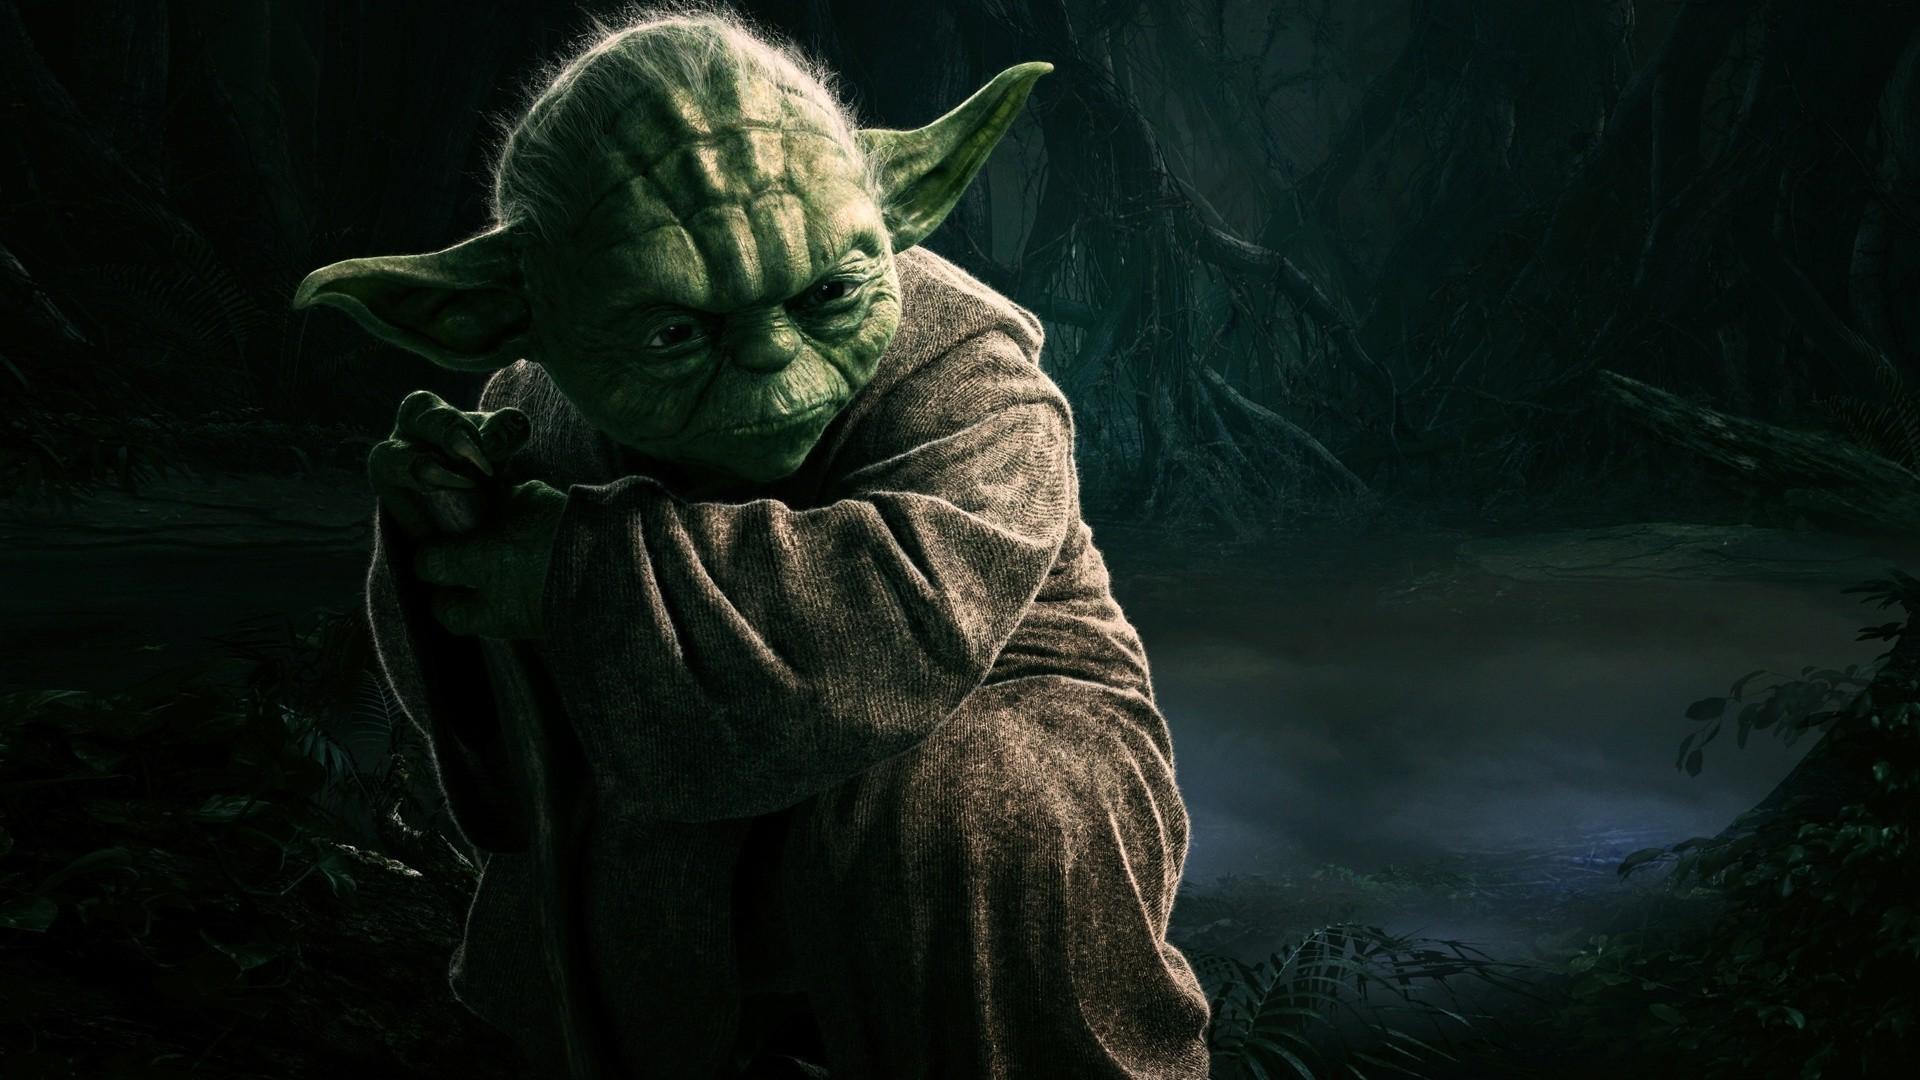 Star Wars Yoda Wallpapers HD Desktop and Mobile Backgrounds | HD Wallpapers  | Pinterest | Wallpaper